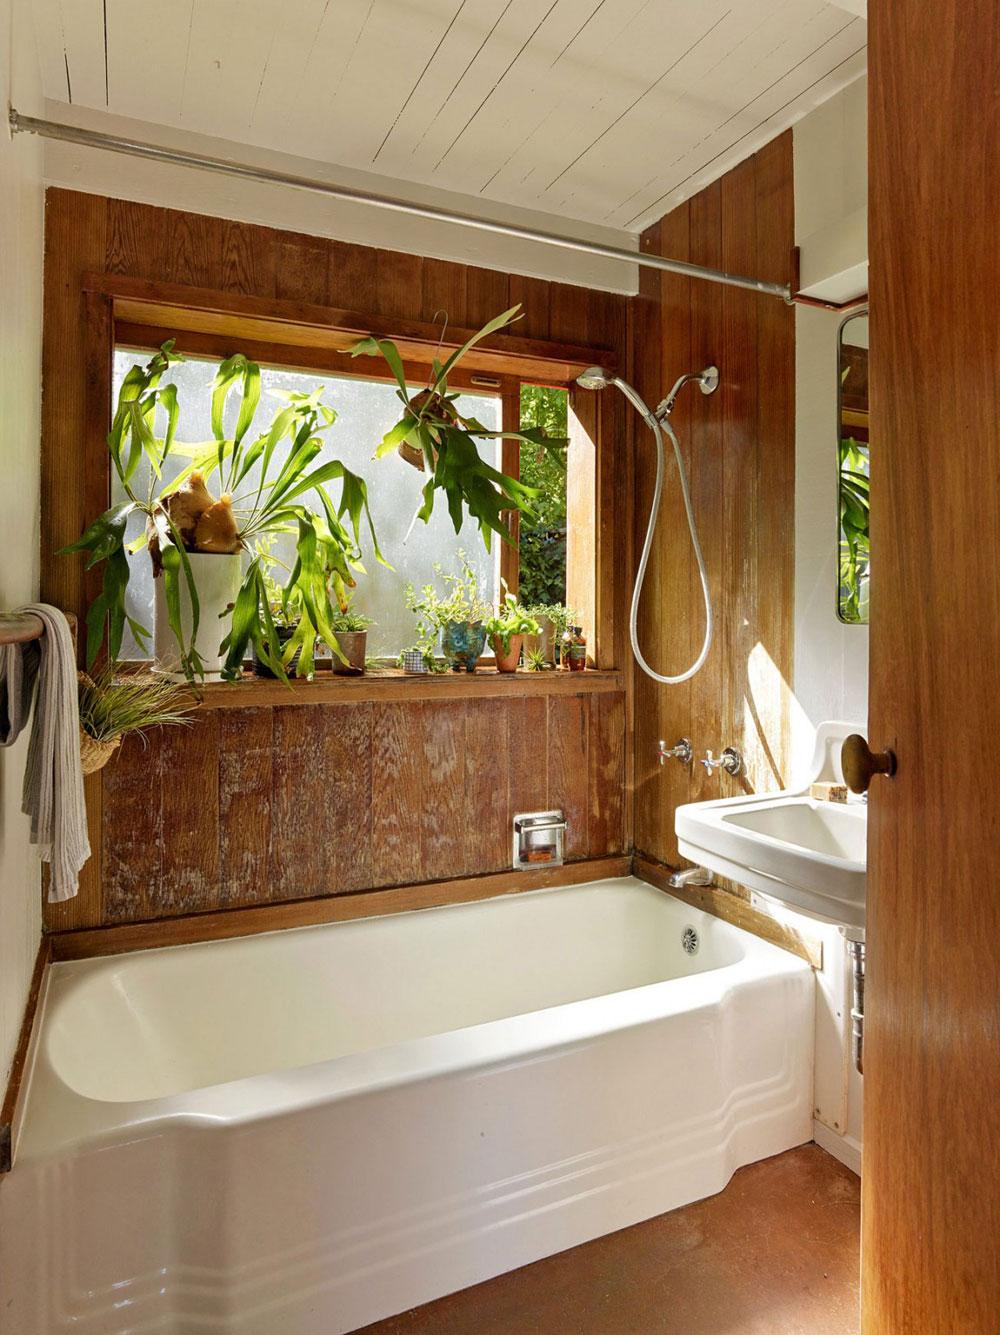 Bathroom-Interior-Design-Photos-Present-Beautiful-Designs-5 Bathroom-Interior-Photos-Present-Beautiful-Designs